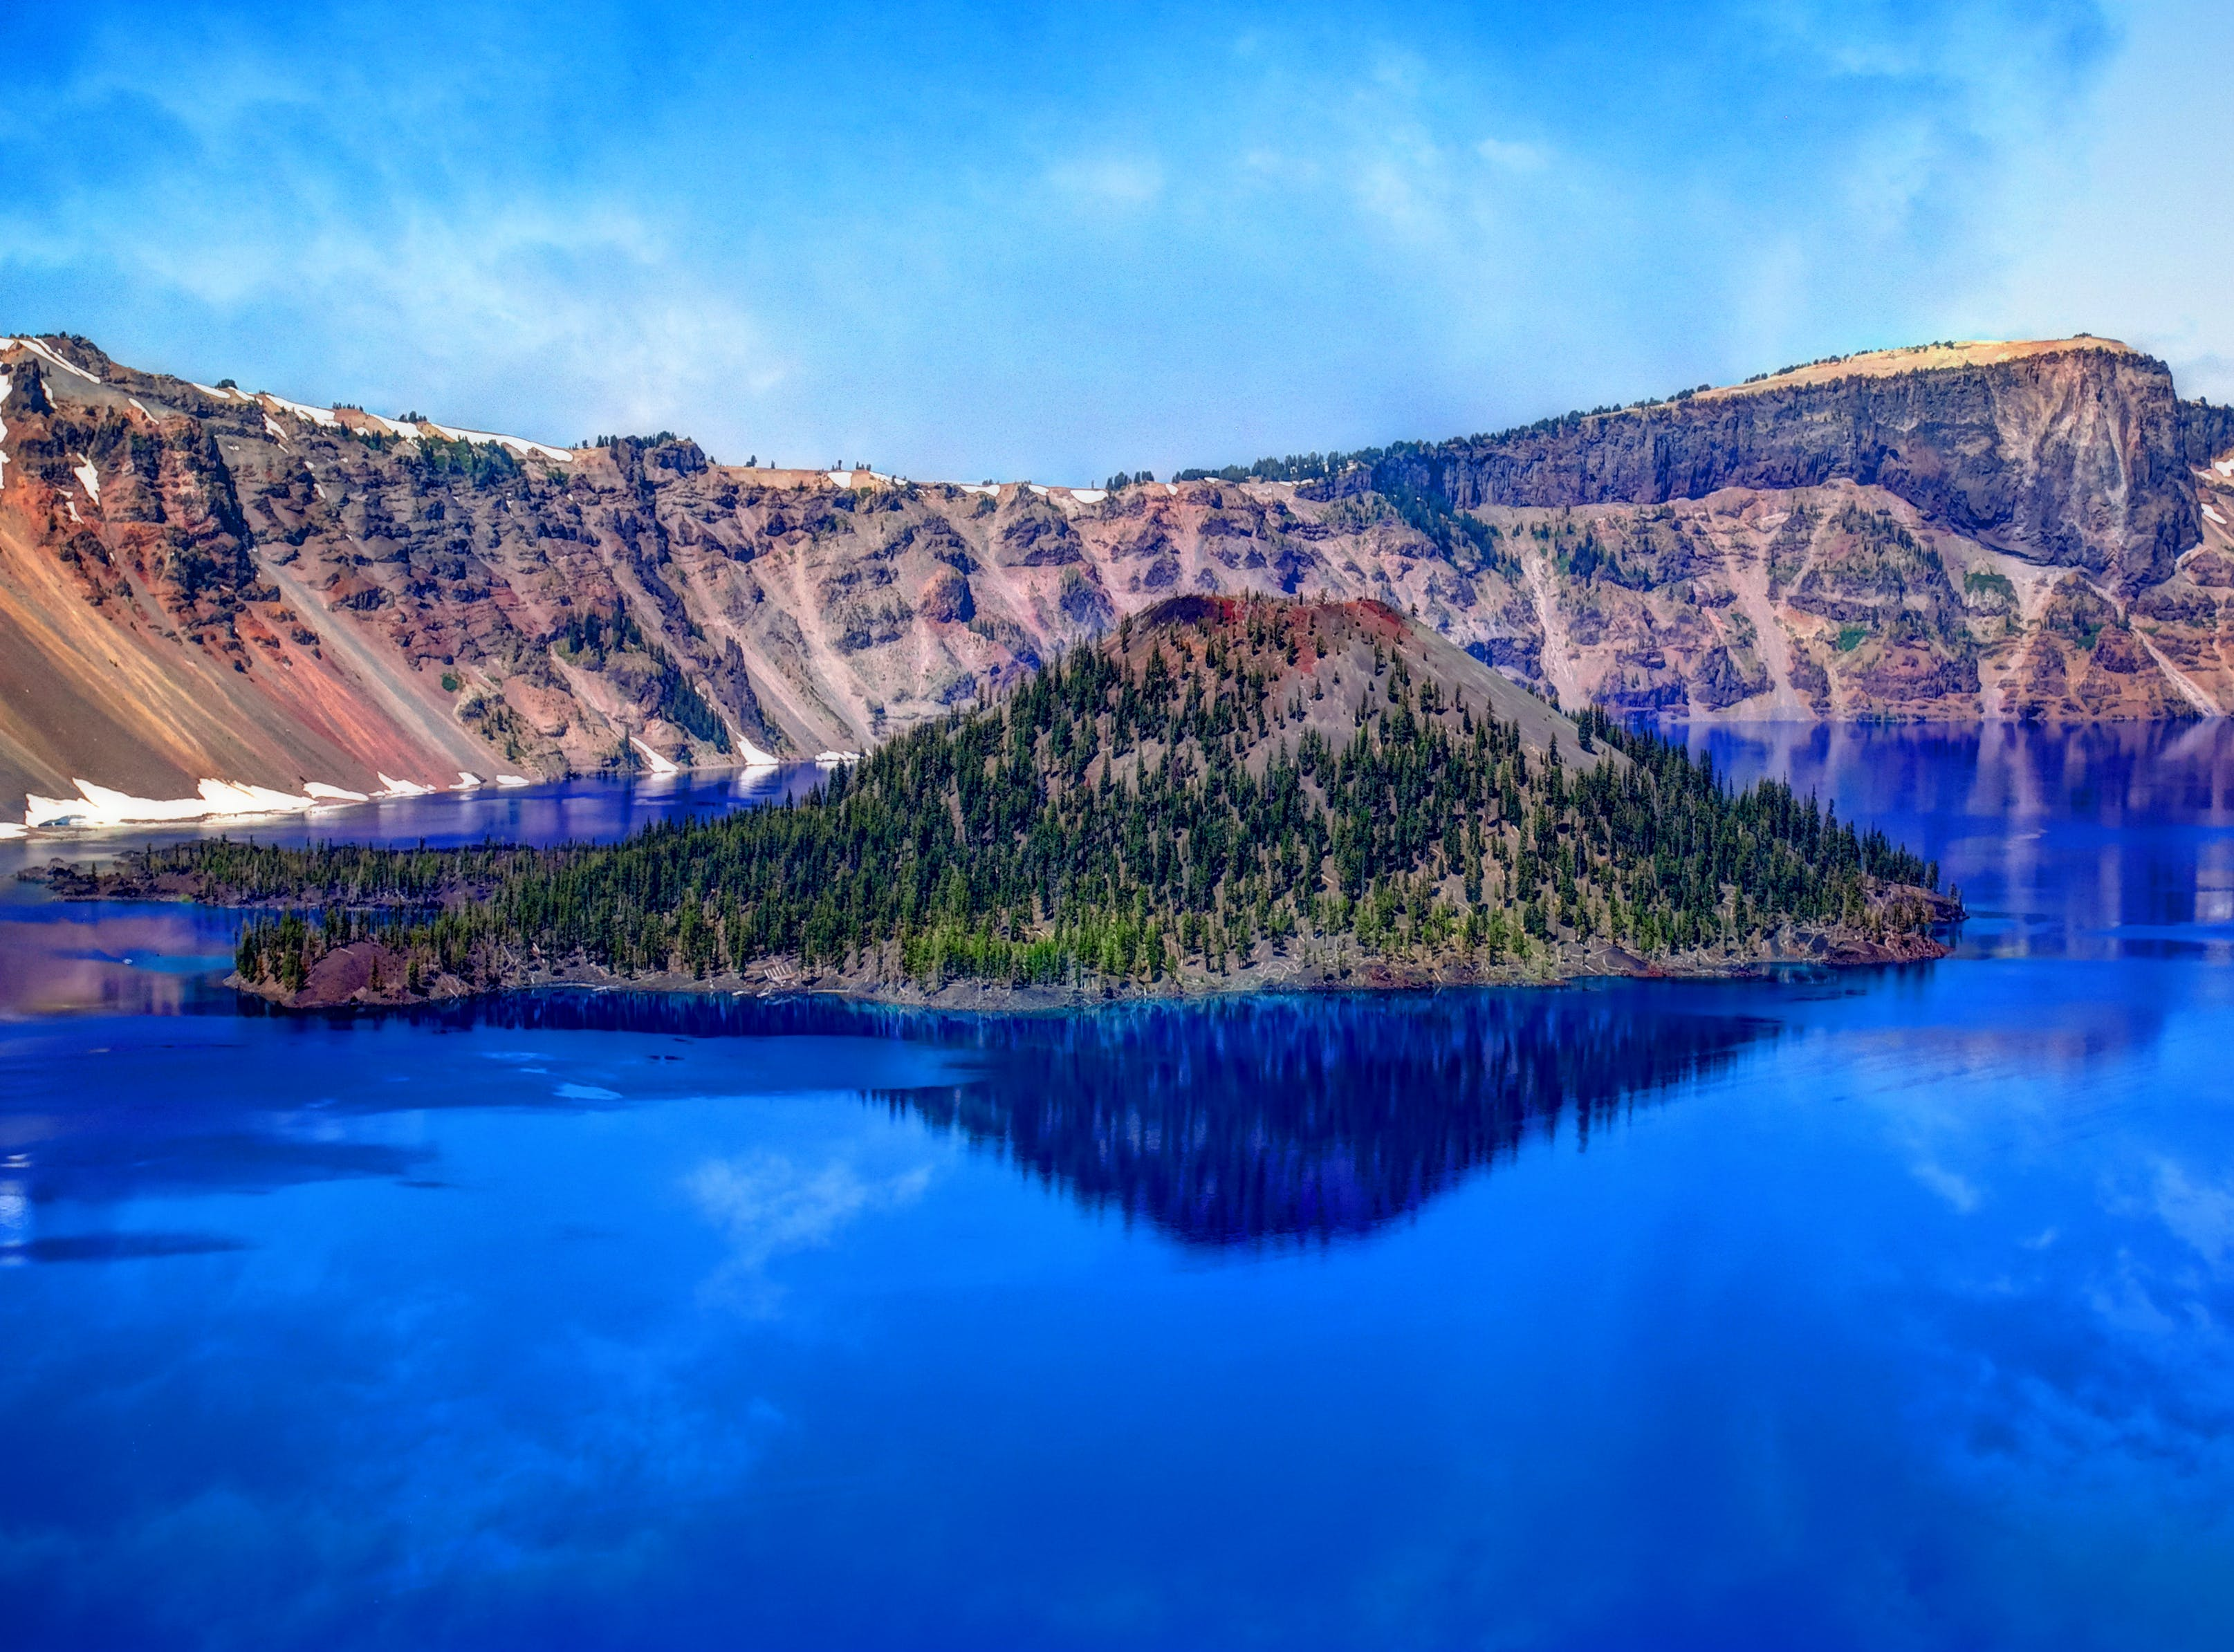 Free stock photo of mountains, nature, lake, island